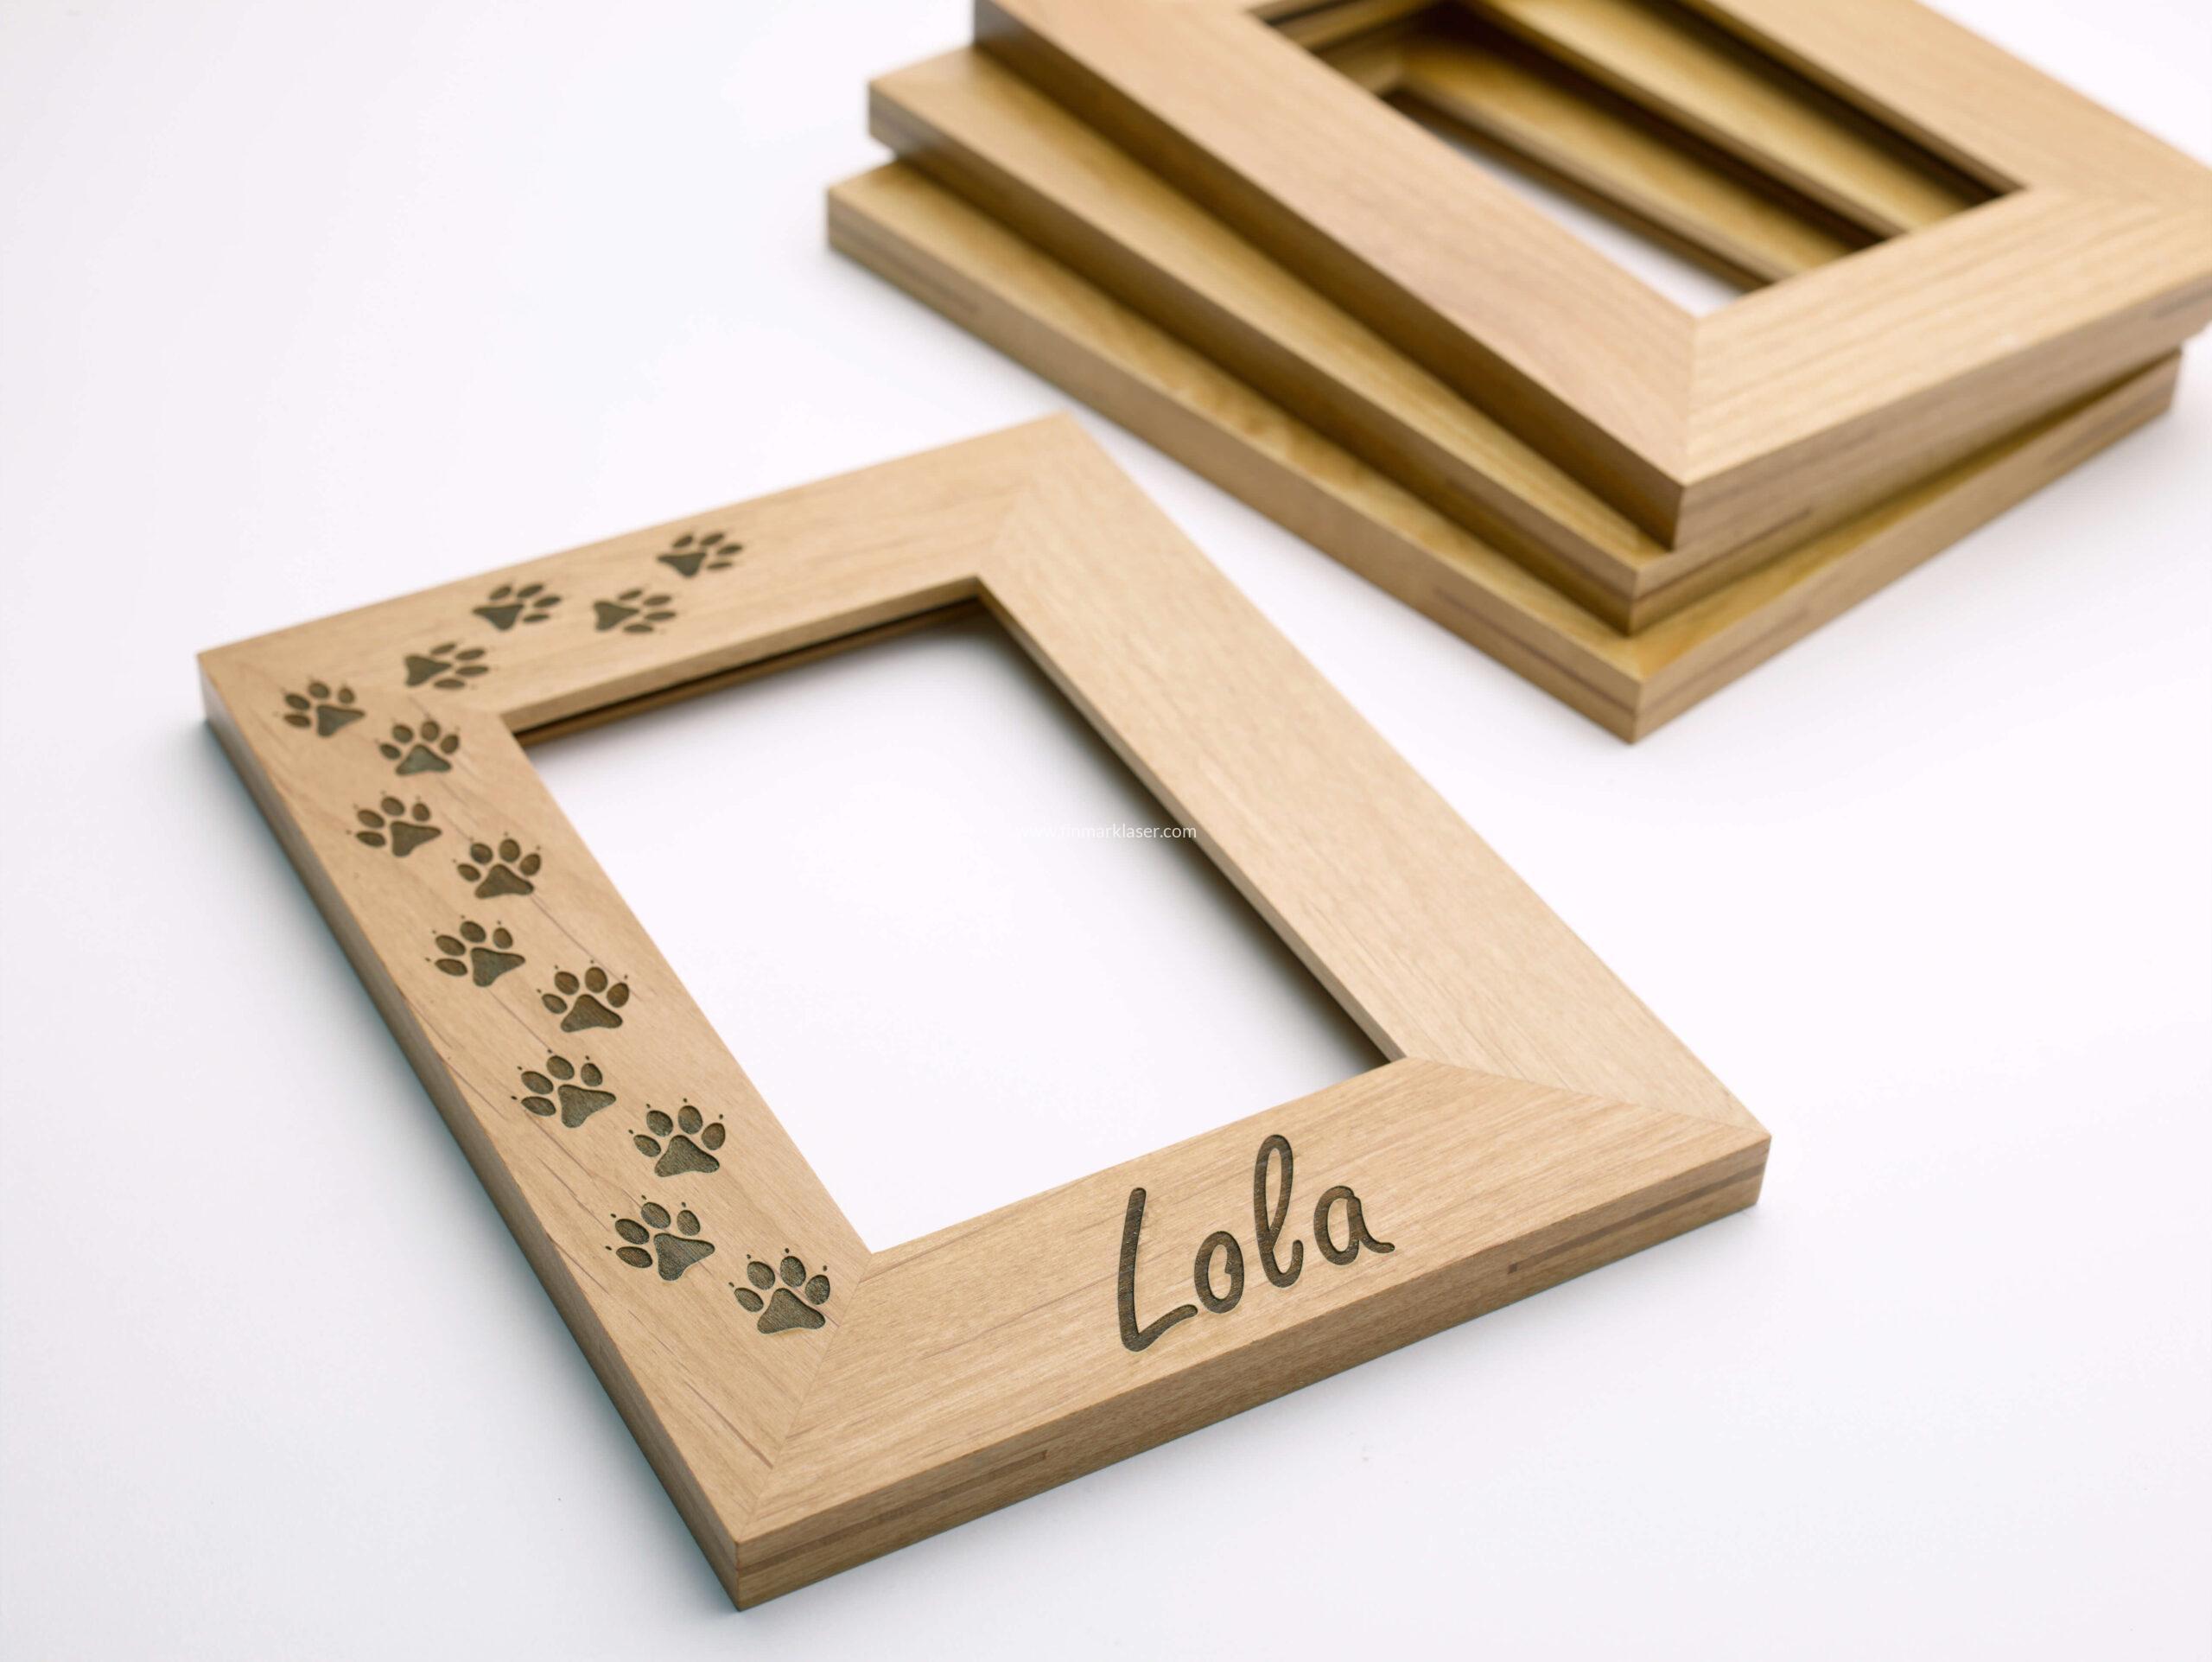 wood3-Frame-Promotional-scaled-1.jpg